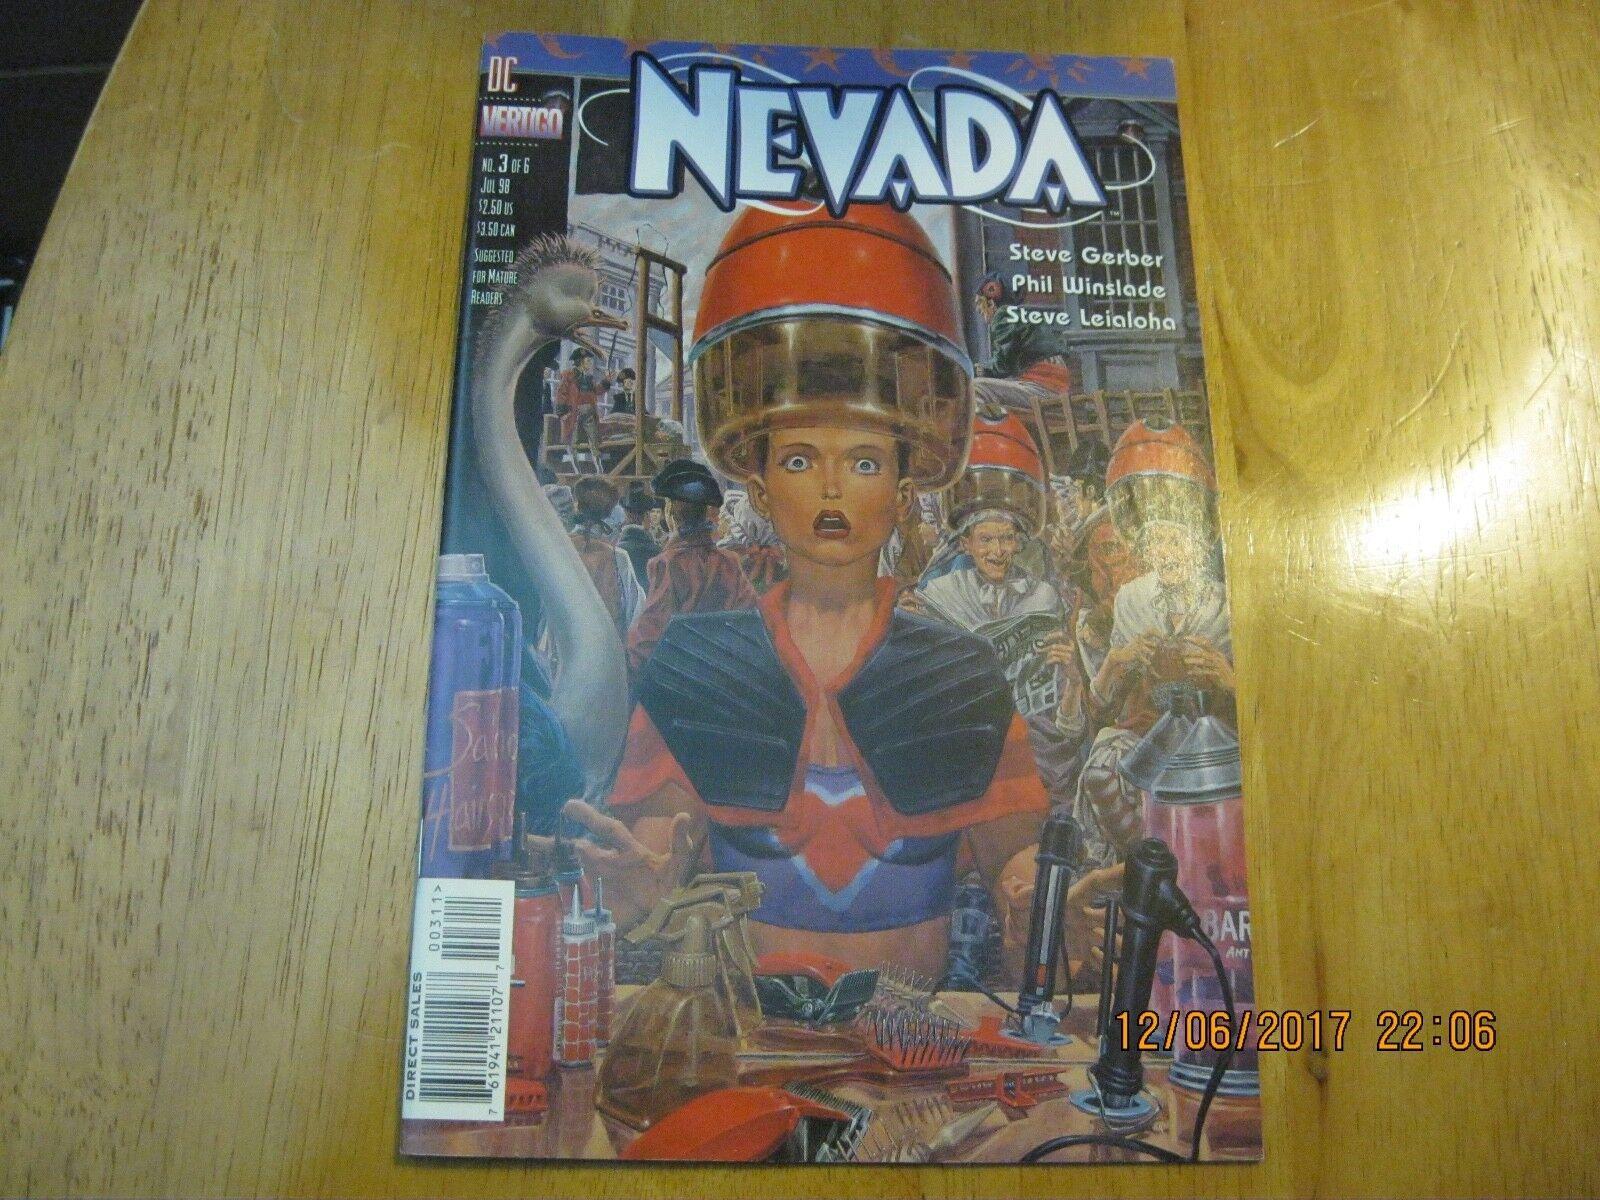 Nevada #3 of 6